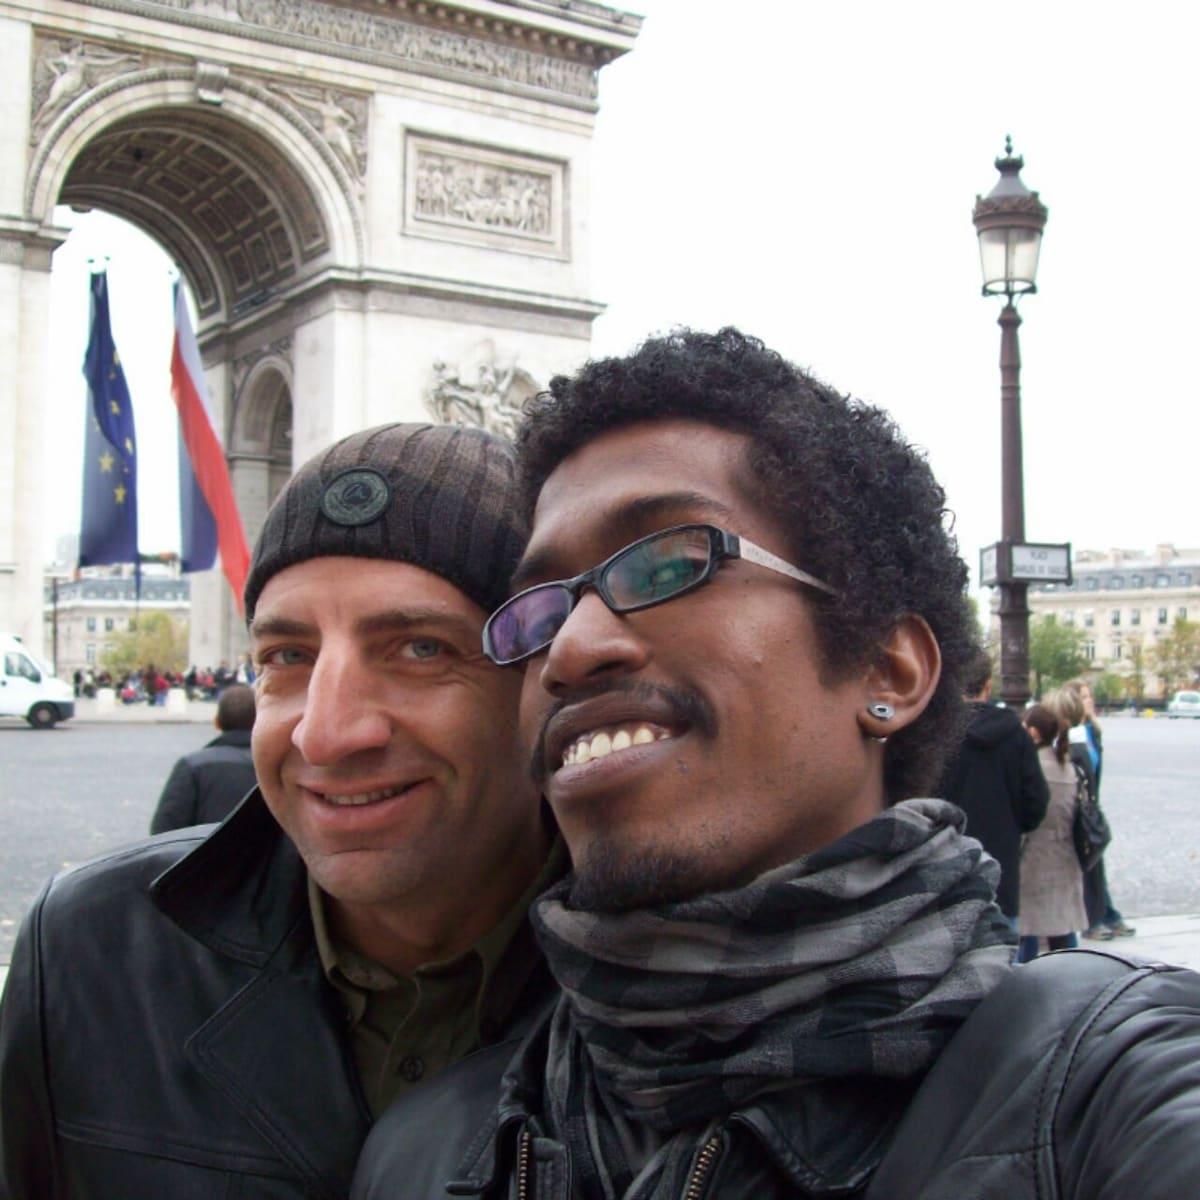 Javier & Joao from Rio de Janeiro